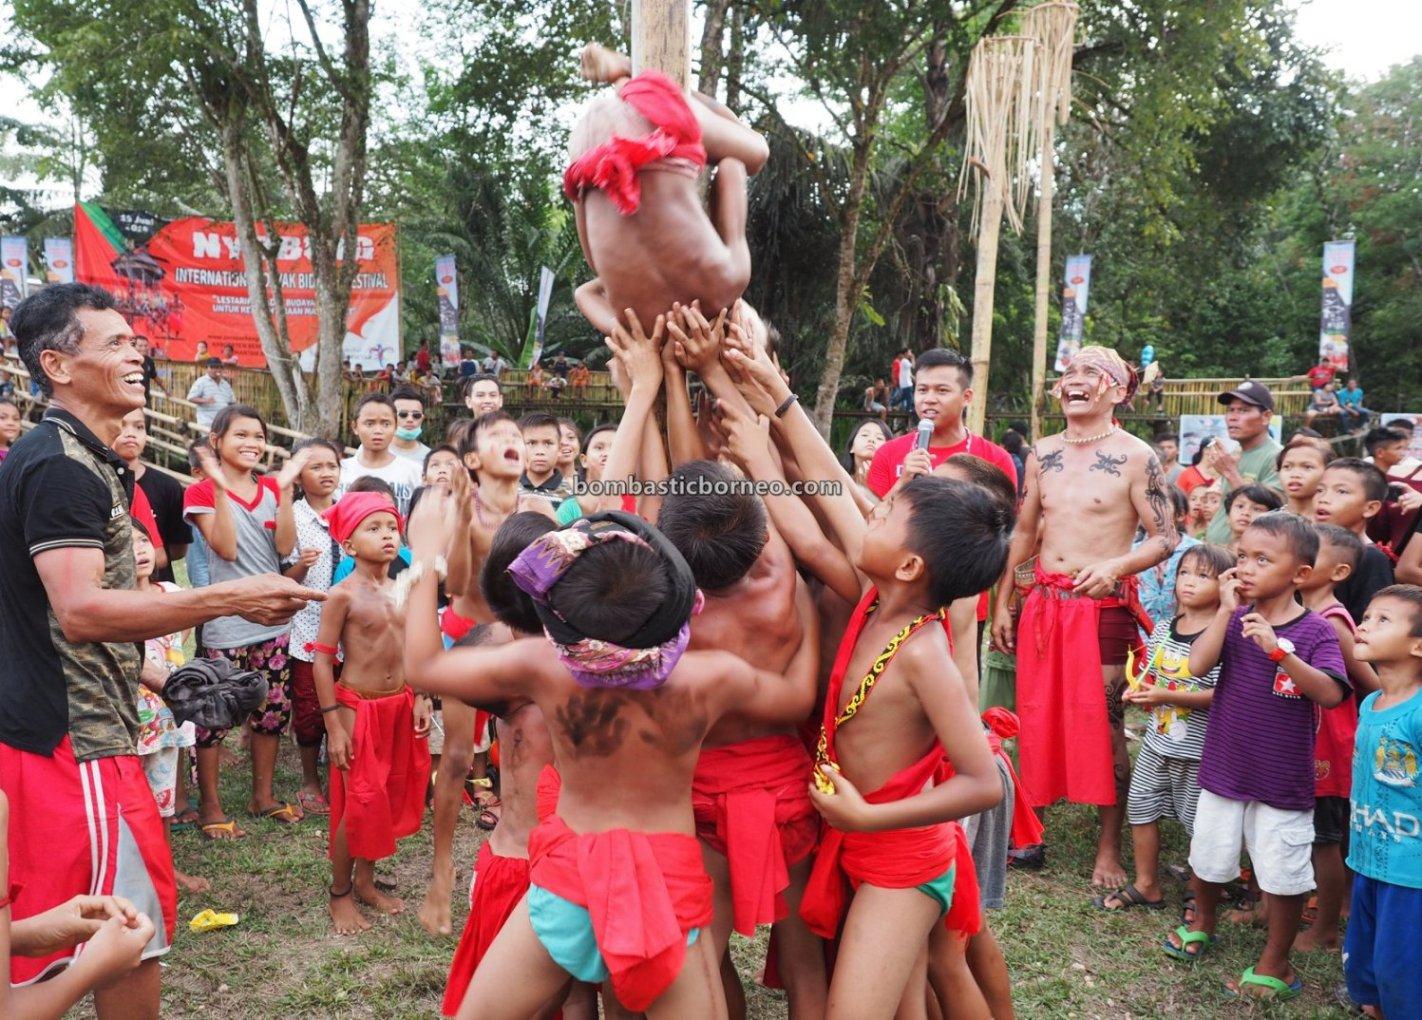 Nyobeng Sebujit, Gawai Harvest Festival, authentic, backpackers, event, Indonesia, Desa Hli Buei, Siding, ethnic, tribe, Tourist attraction, travel guide, Trans Borneo, 印尼西加里曼丹, 原住民传统丰收节. 婆罗洲比达友部落